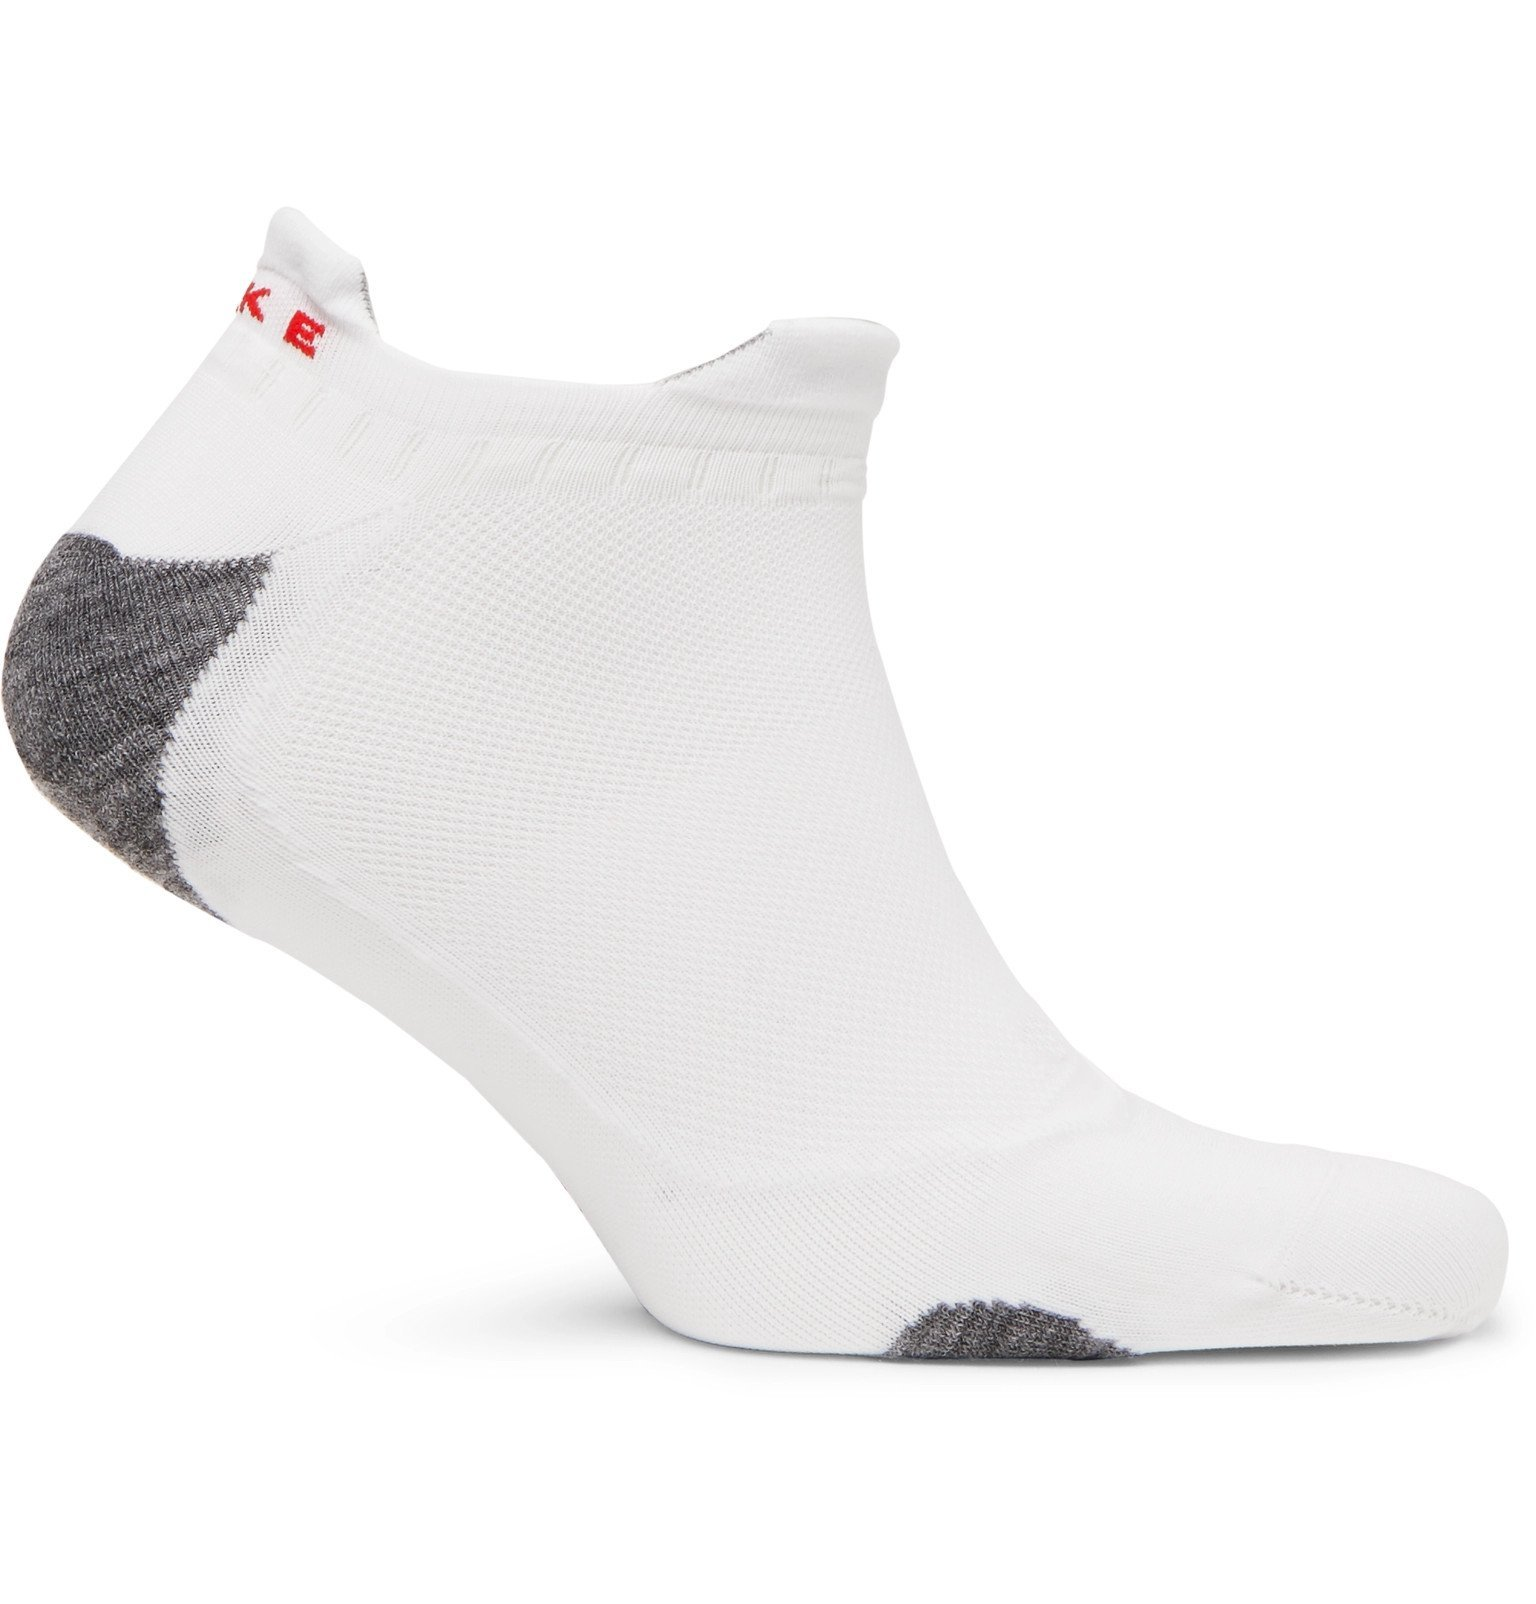 Photo: FALKE Ergonomic Sport System - RU5 Stretch-Knit No-Show Socks - White